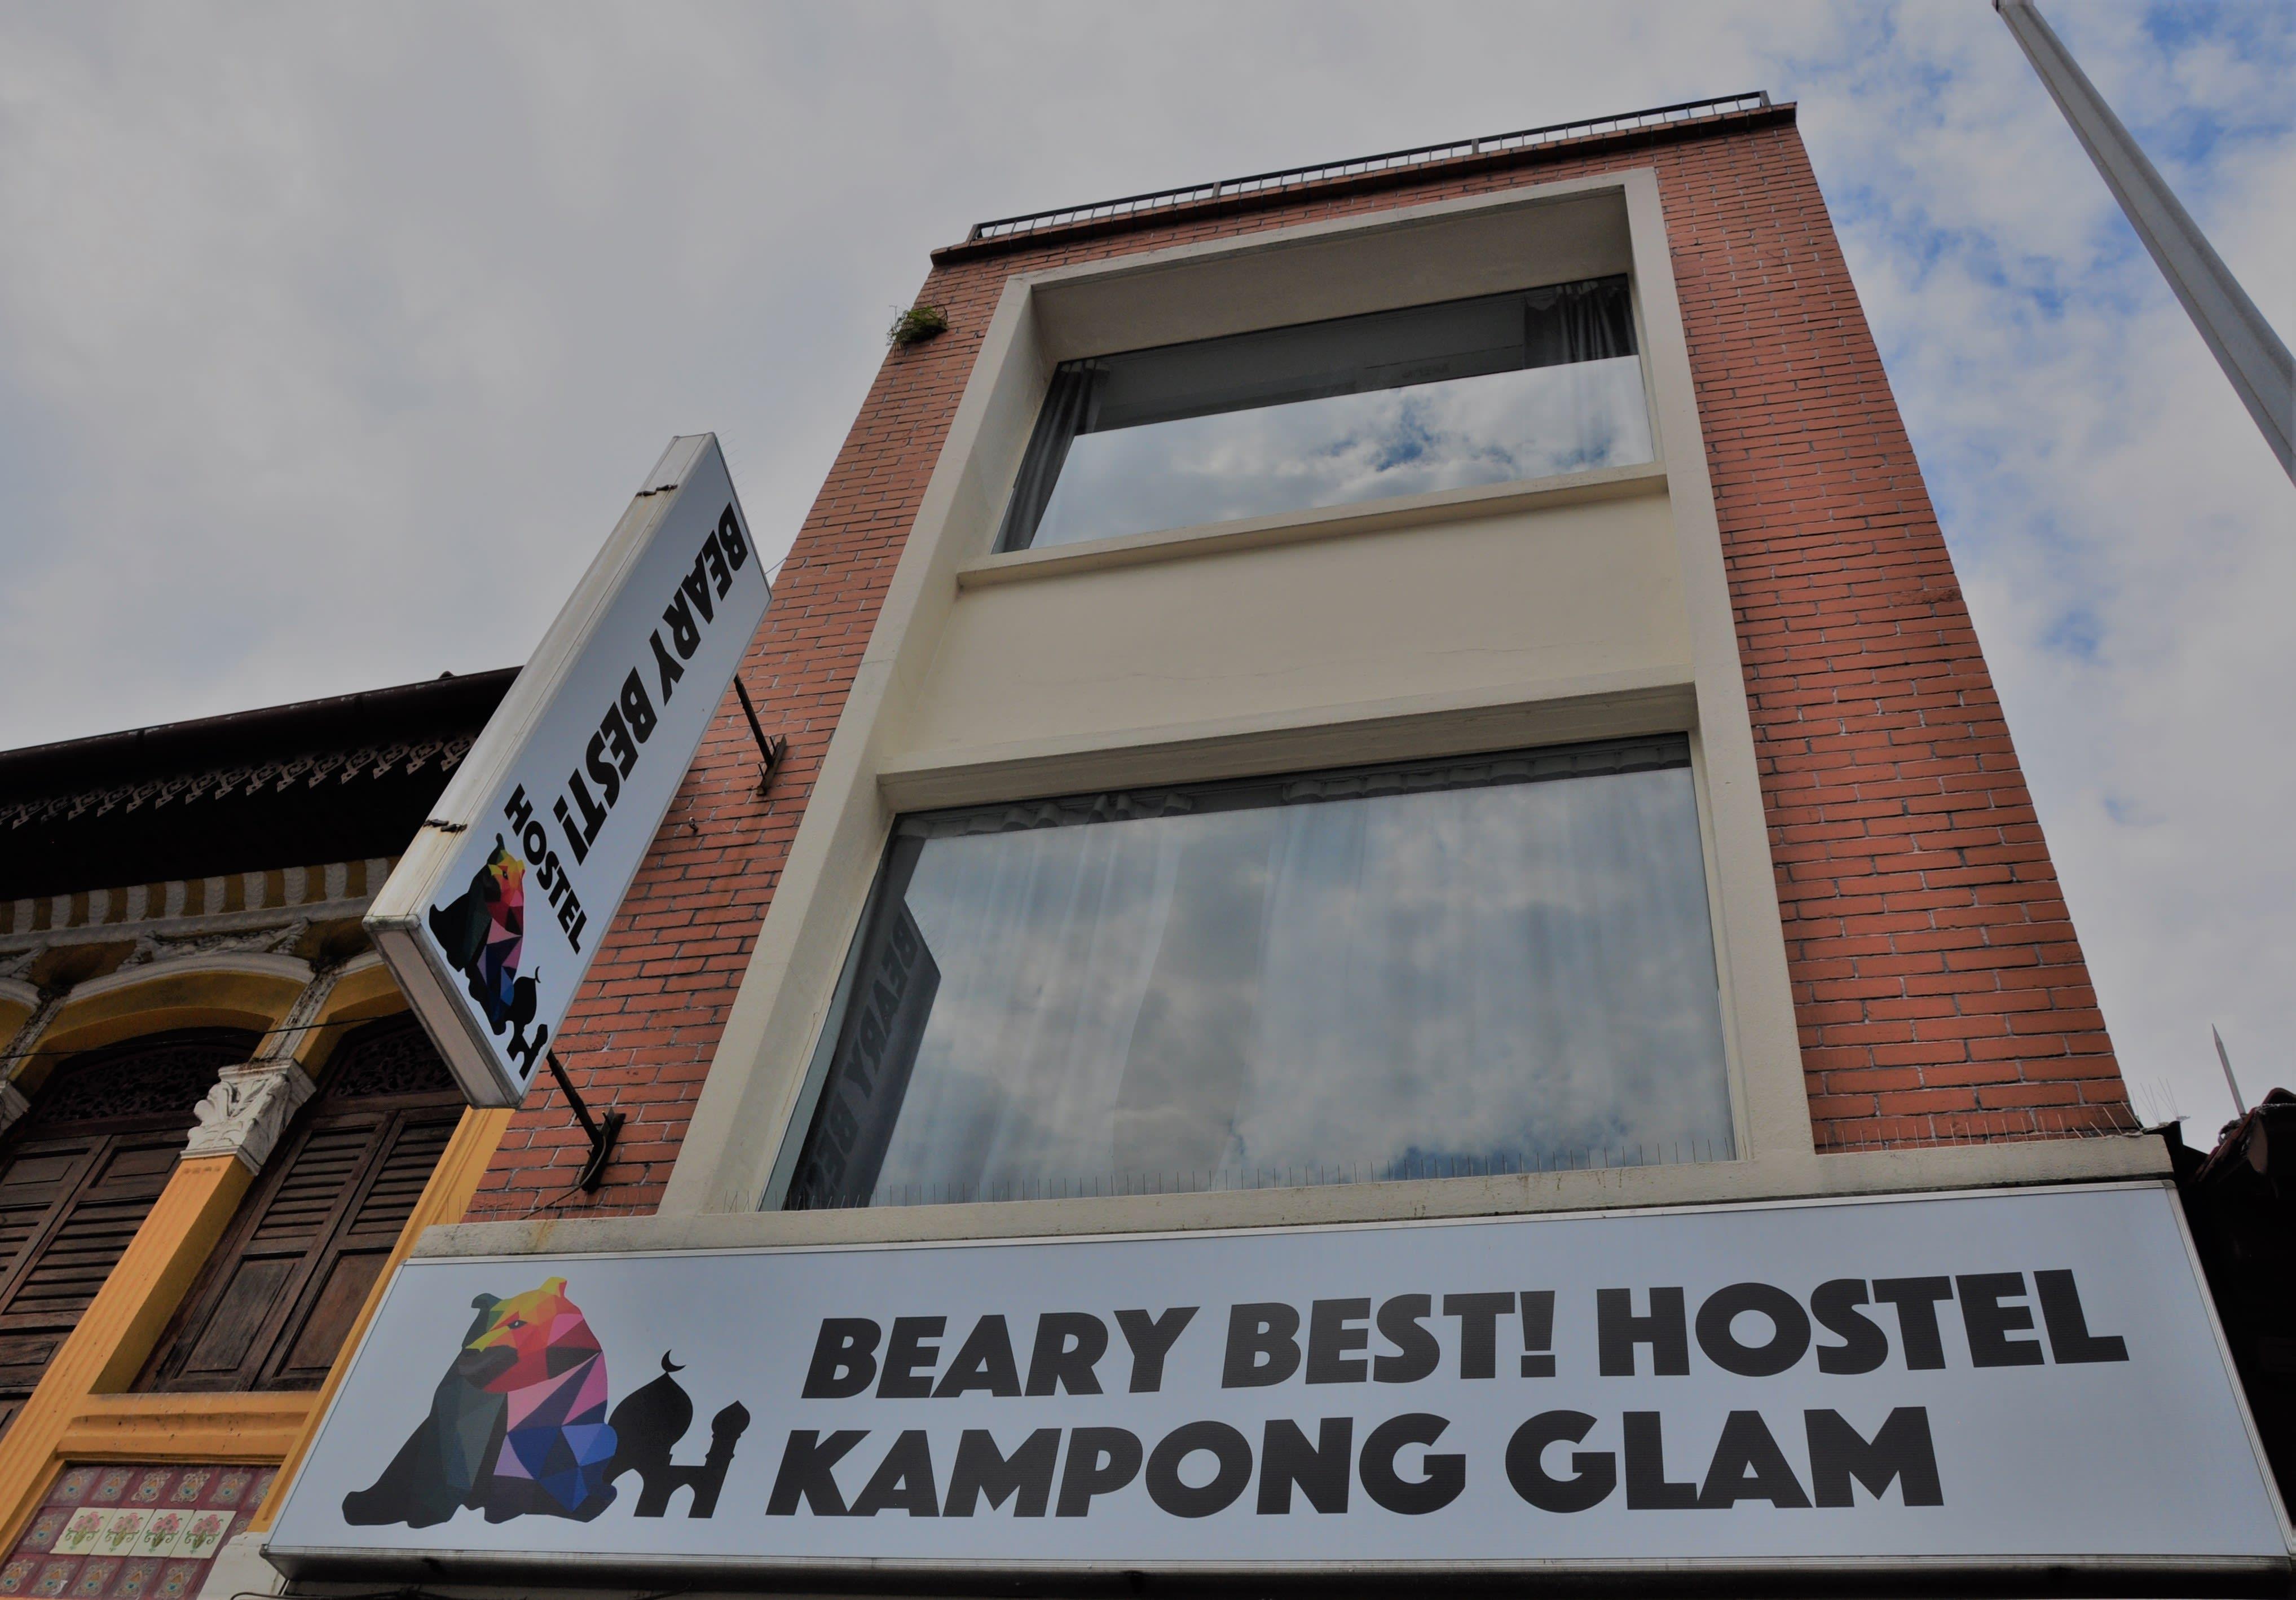 HOSTEL - Beary Best! Kampong Glam